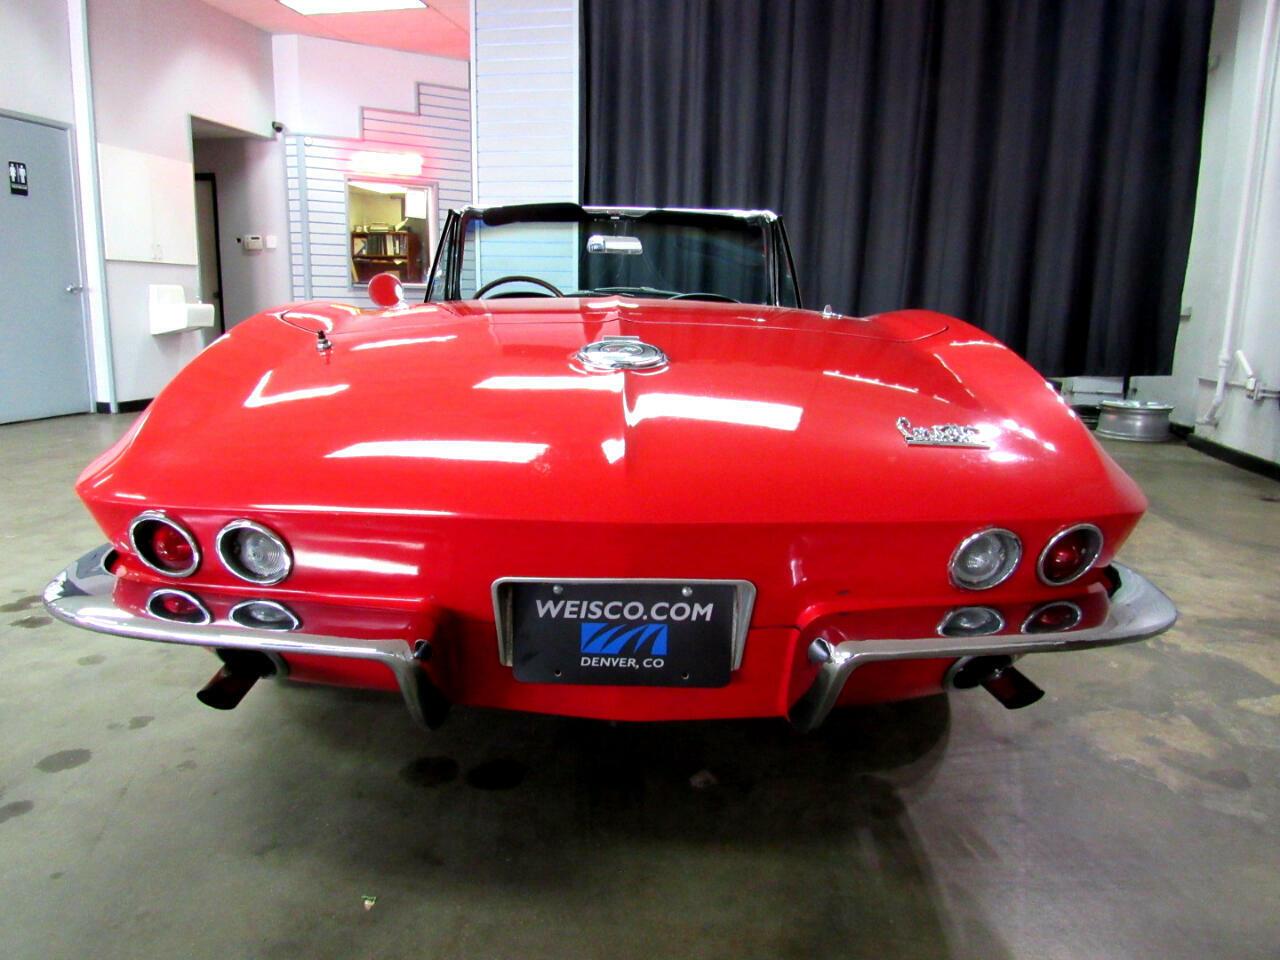 1966 Red Chevrolet Corvette Convertible    C2 Corvette Photo 6